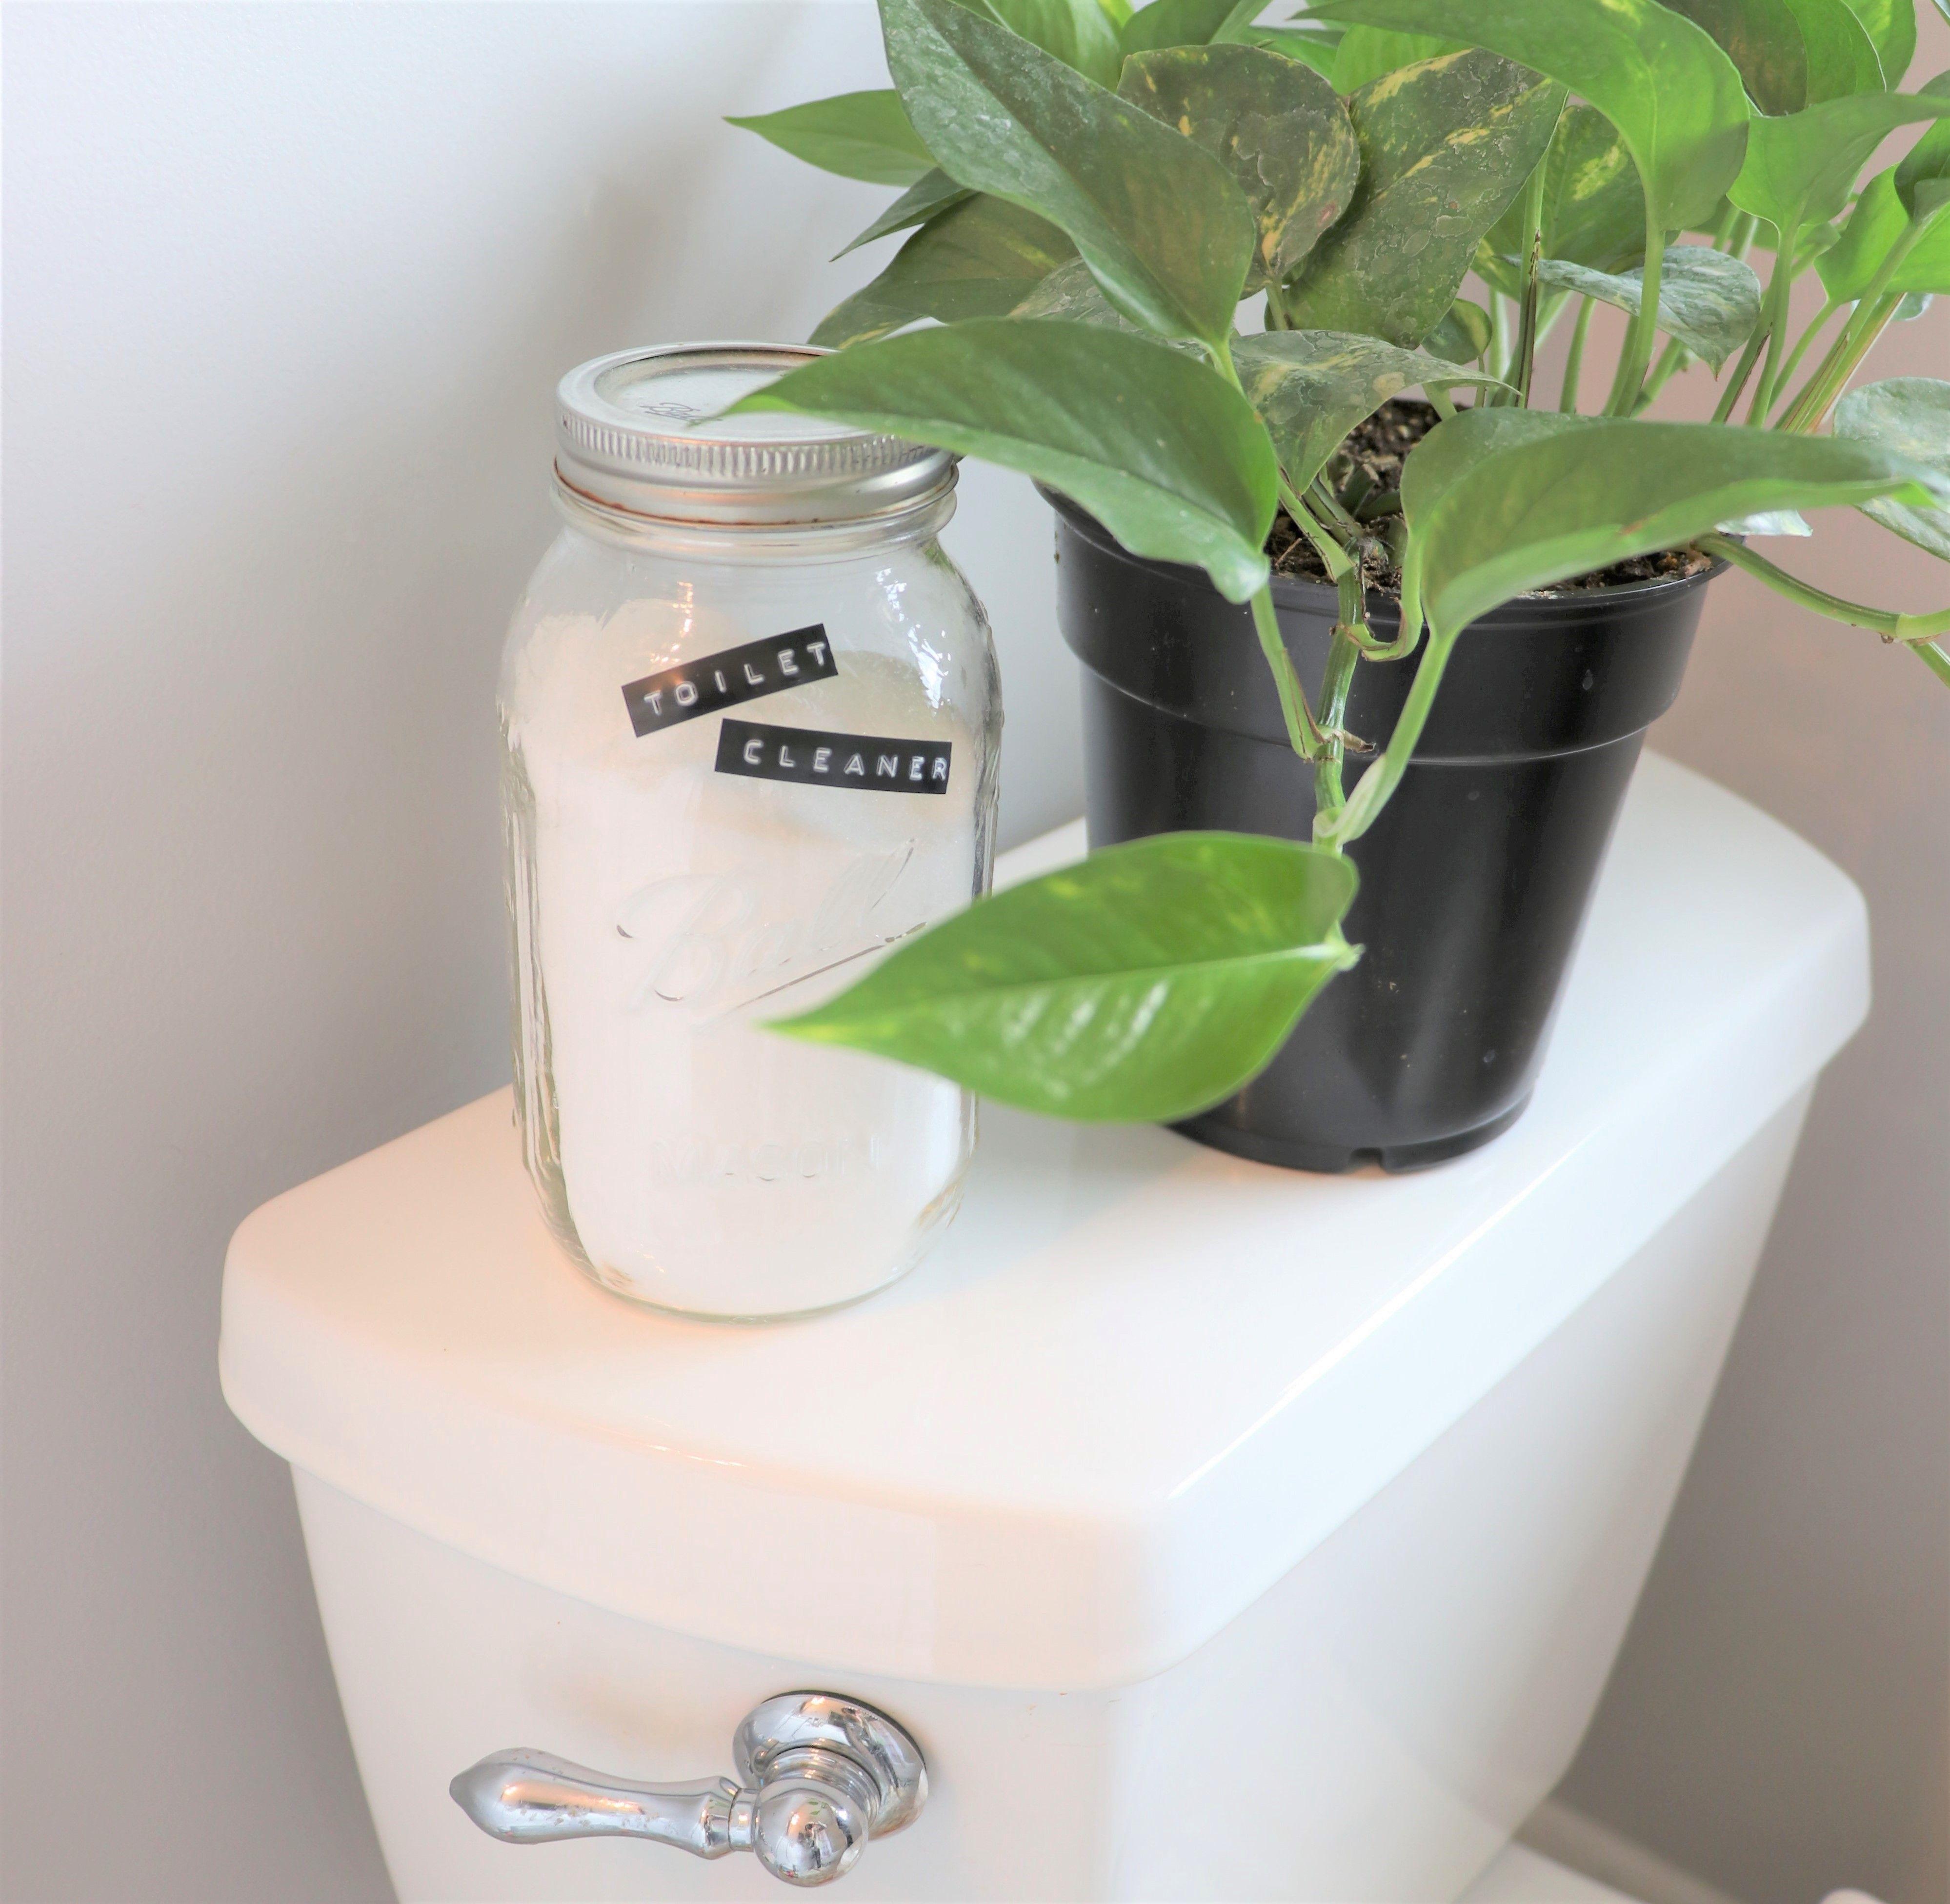 DIY Toilet Cleaner Recipe